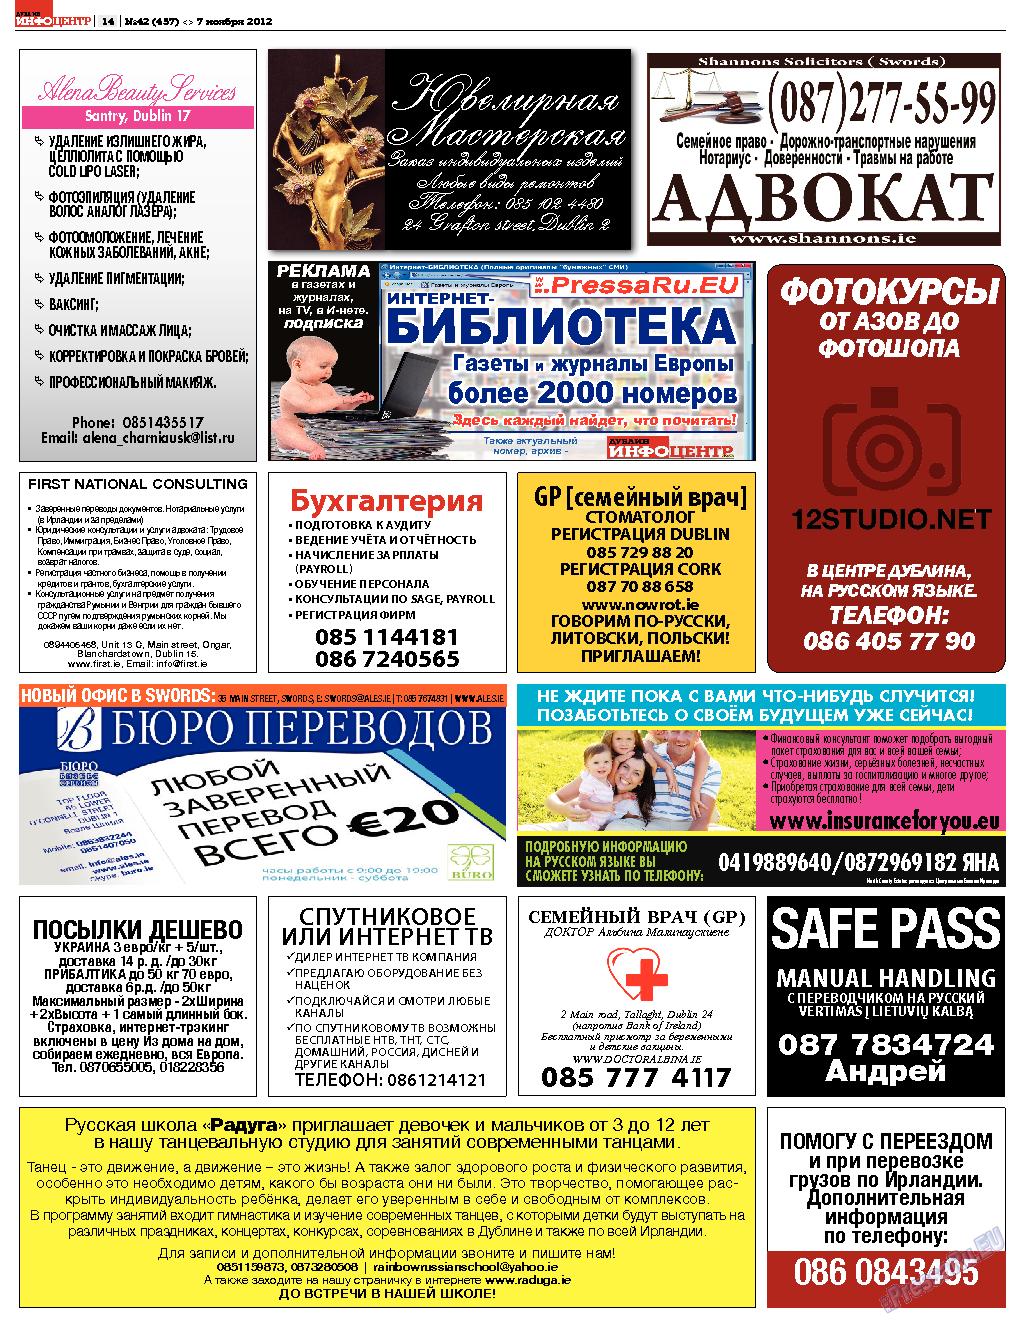 Дублин инфоцентр (газета). 2012 год, номер 42, стр. 14